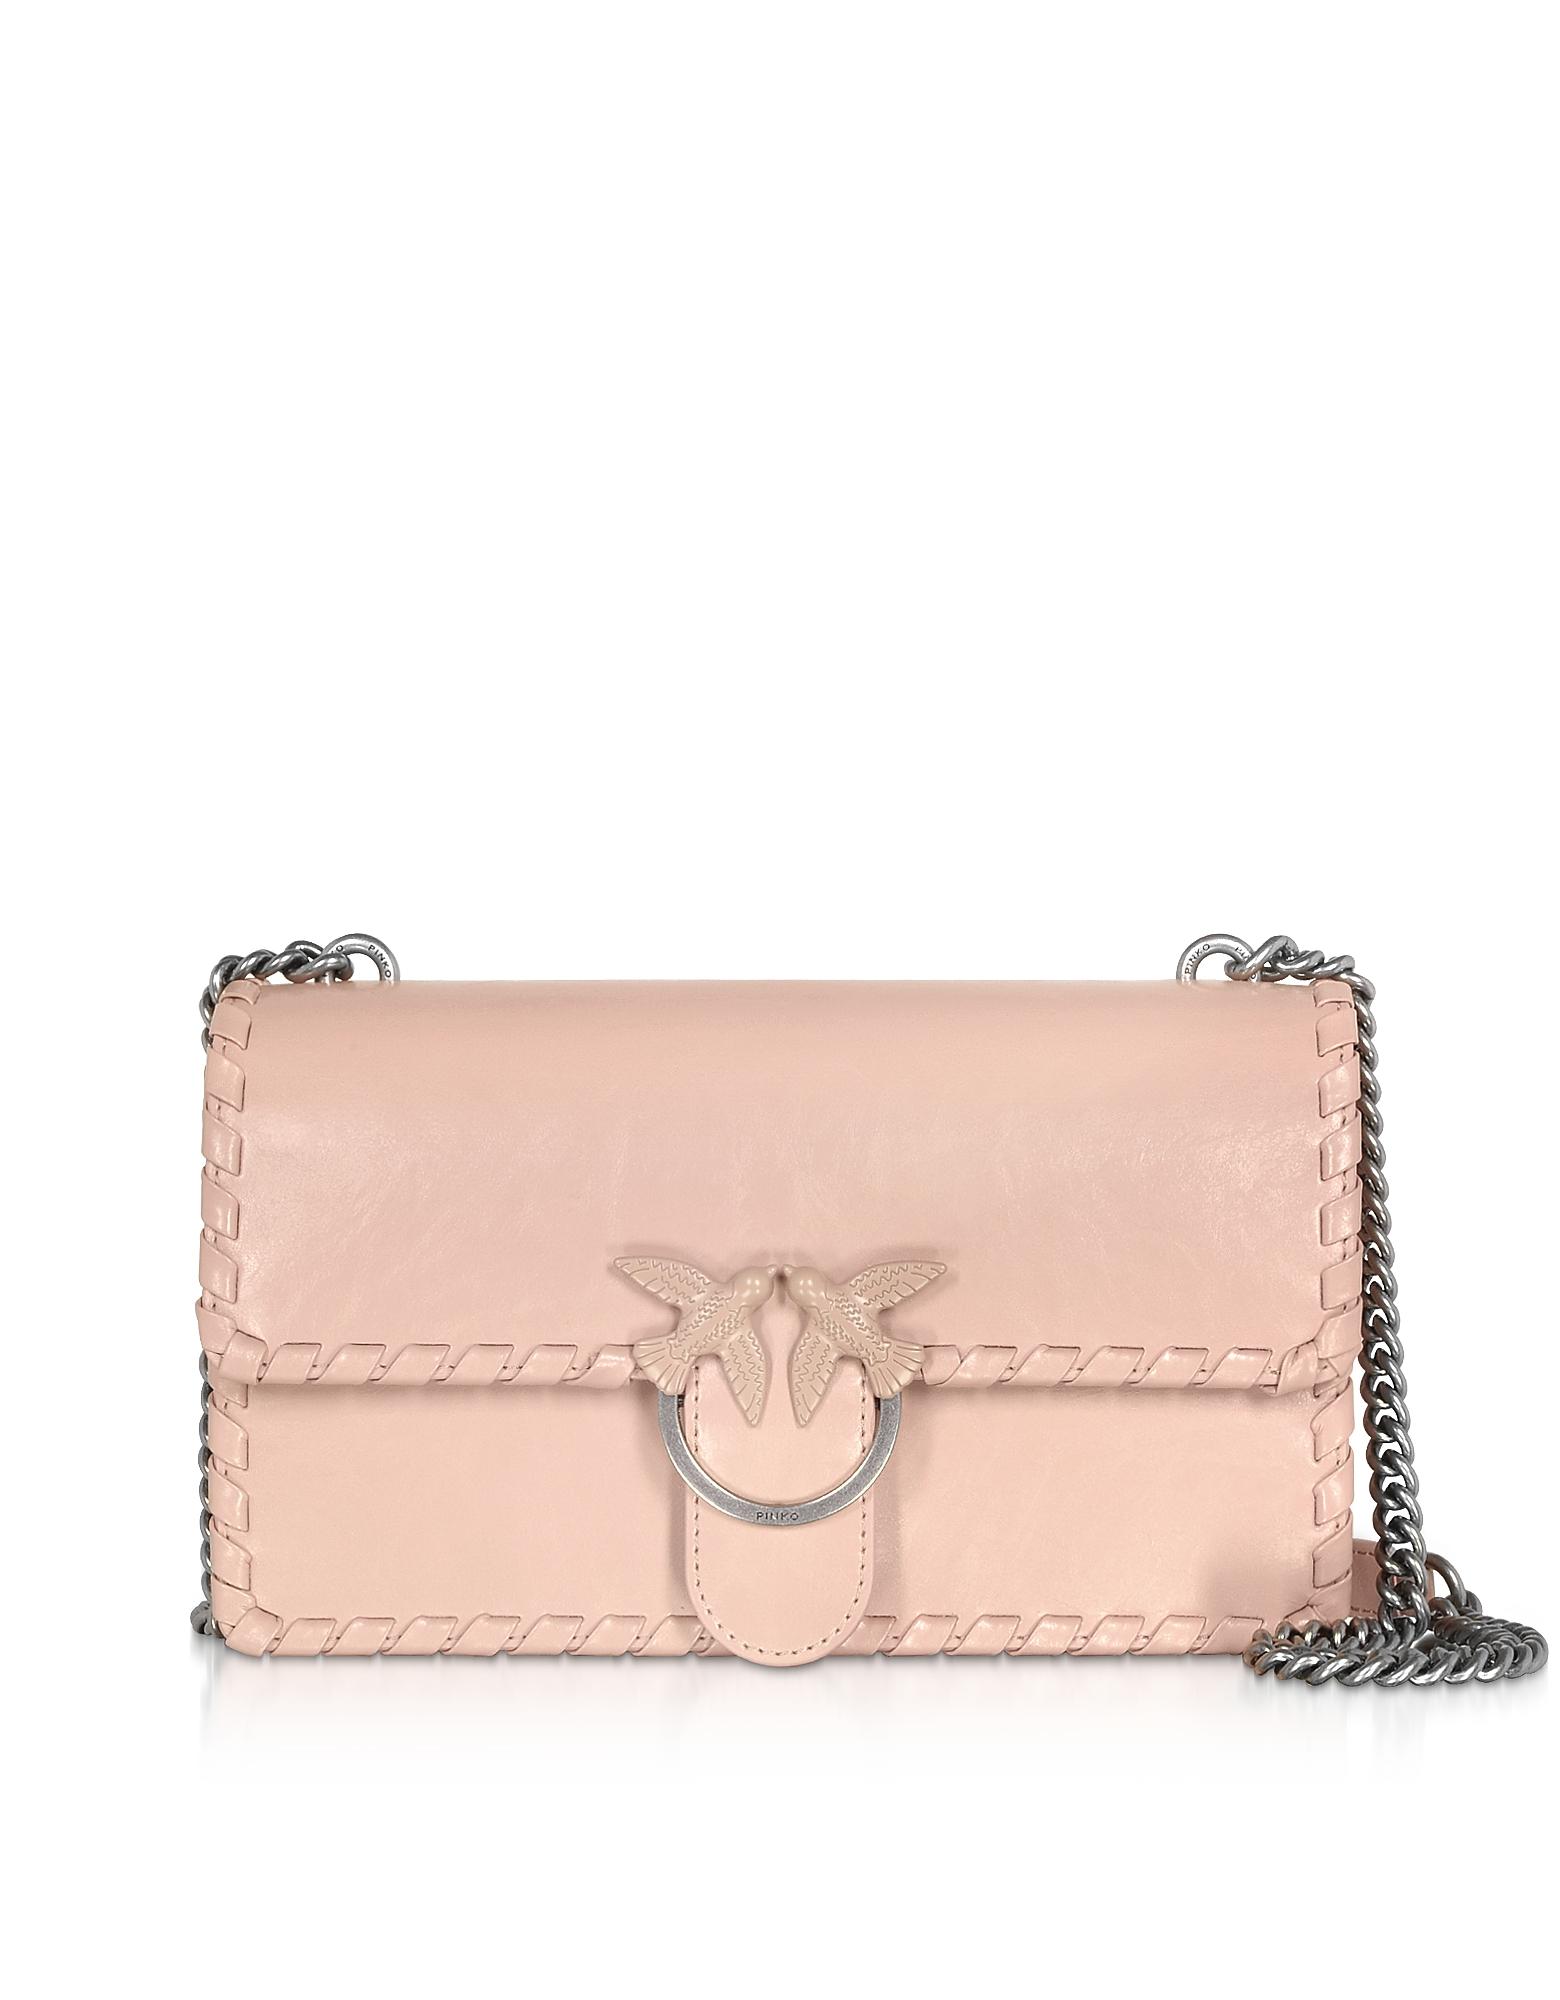 Pinko Designer Handbags, Love Twist Leather Shoulder Bag